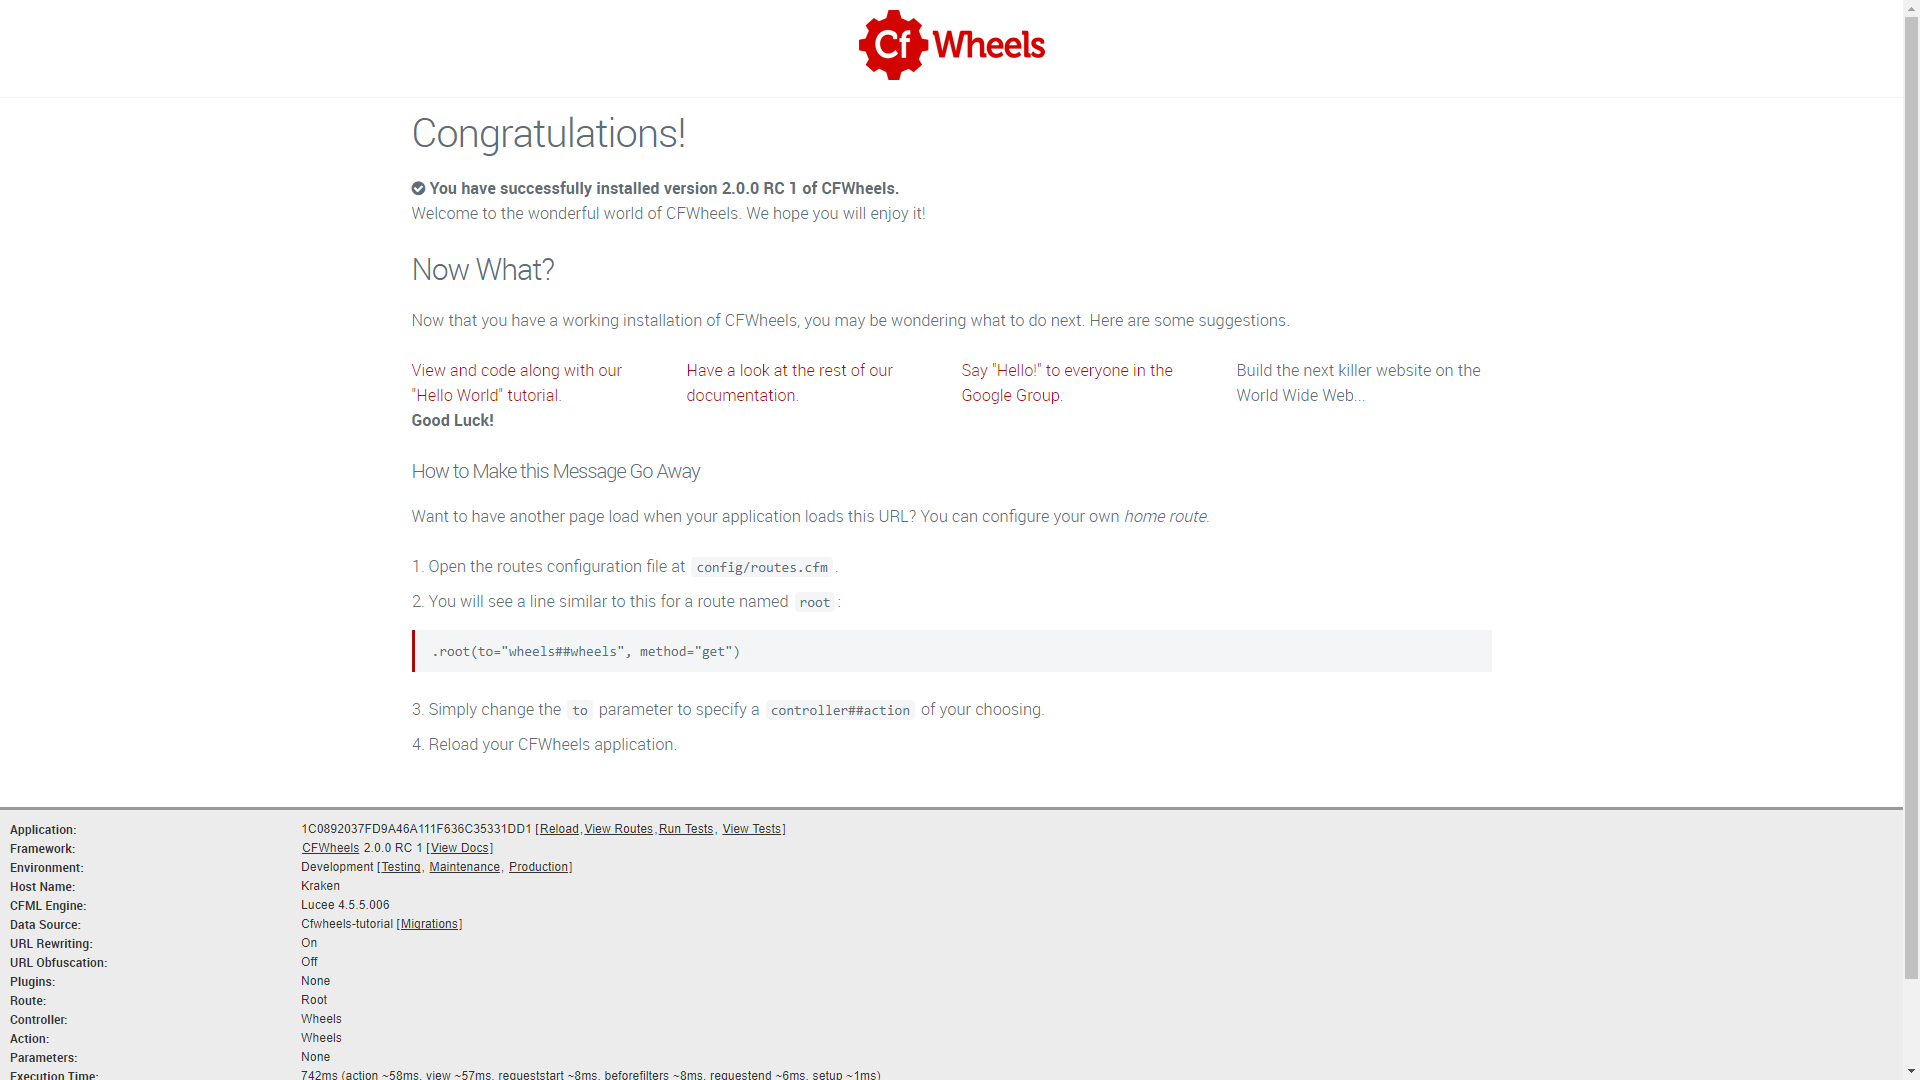 Figure 1: Wheels congratulations screen